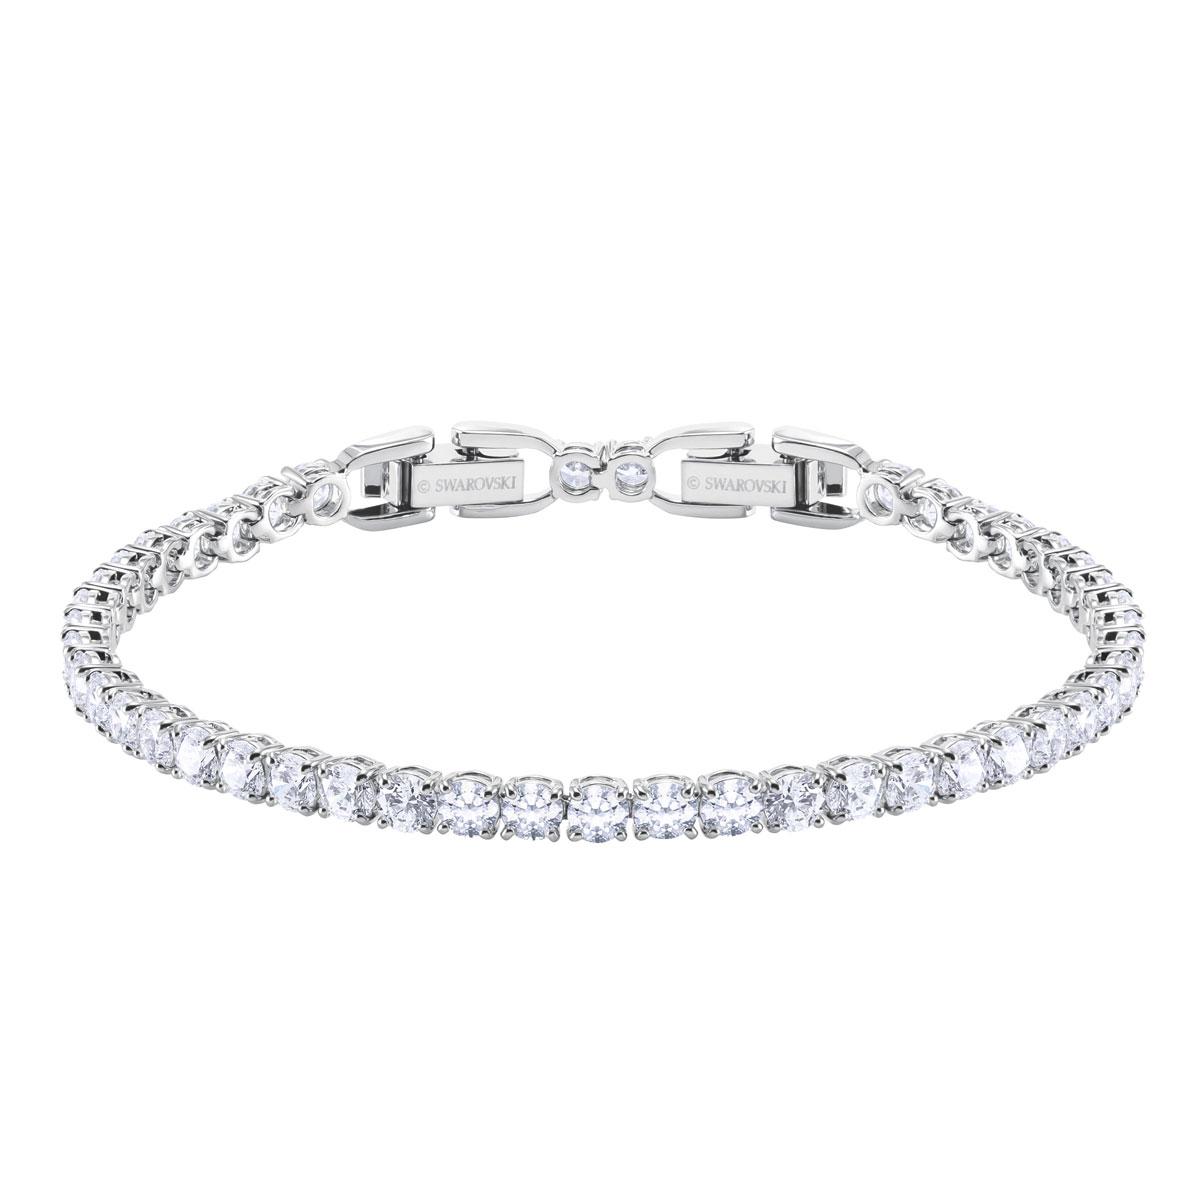 Swarovski Tennis Deluxe Bracelet, White, Rhodium